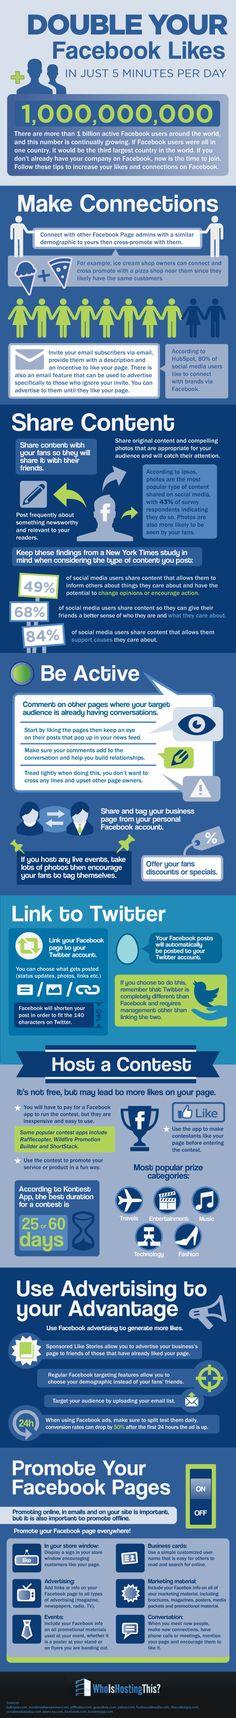 Creating #Facebook Engagement #Infographic | via #BornToBeSocial